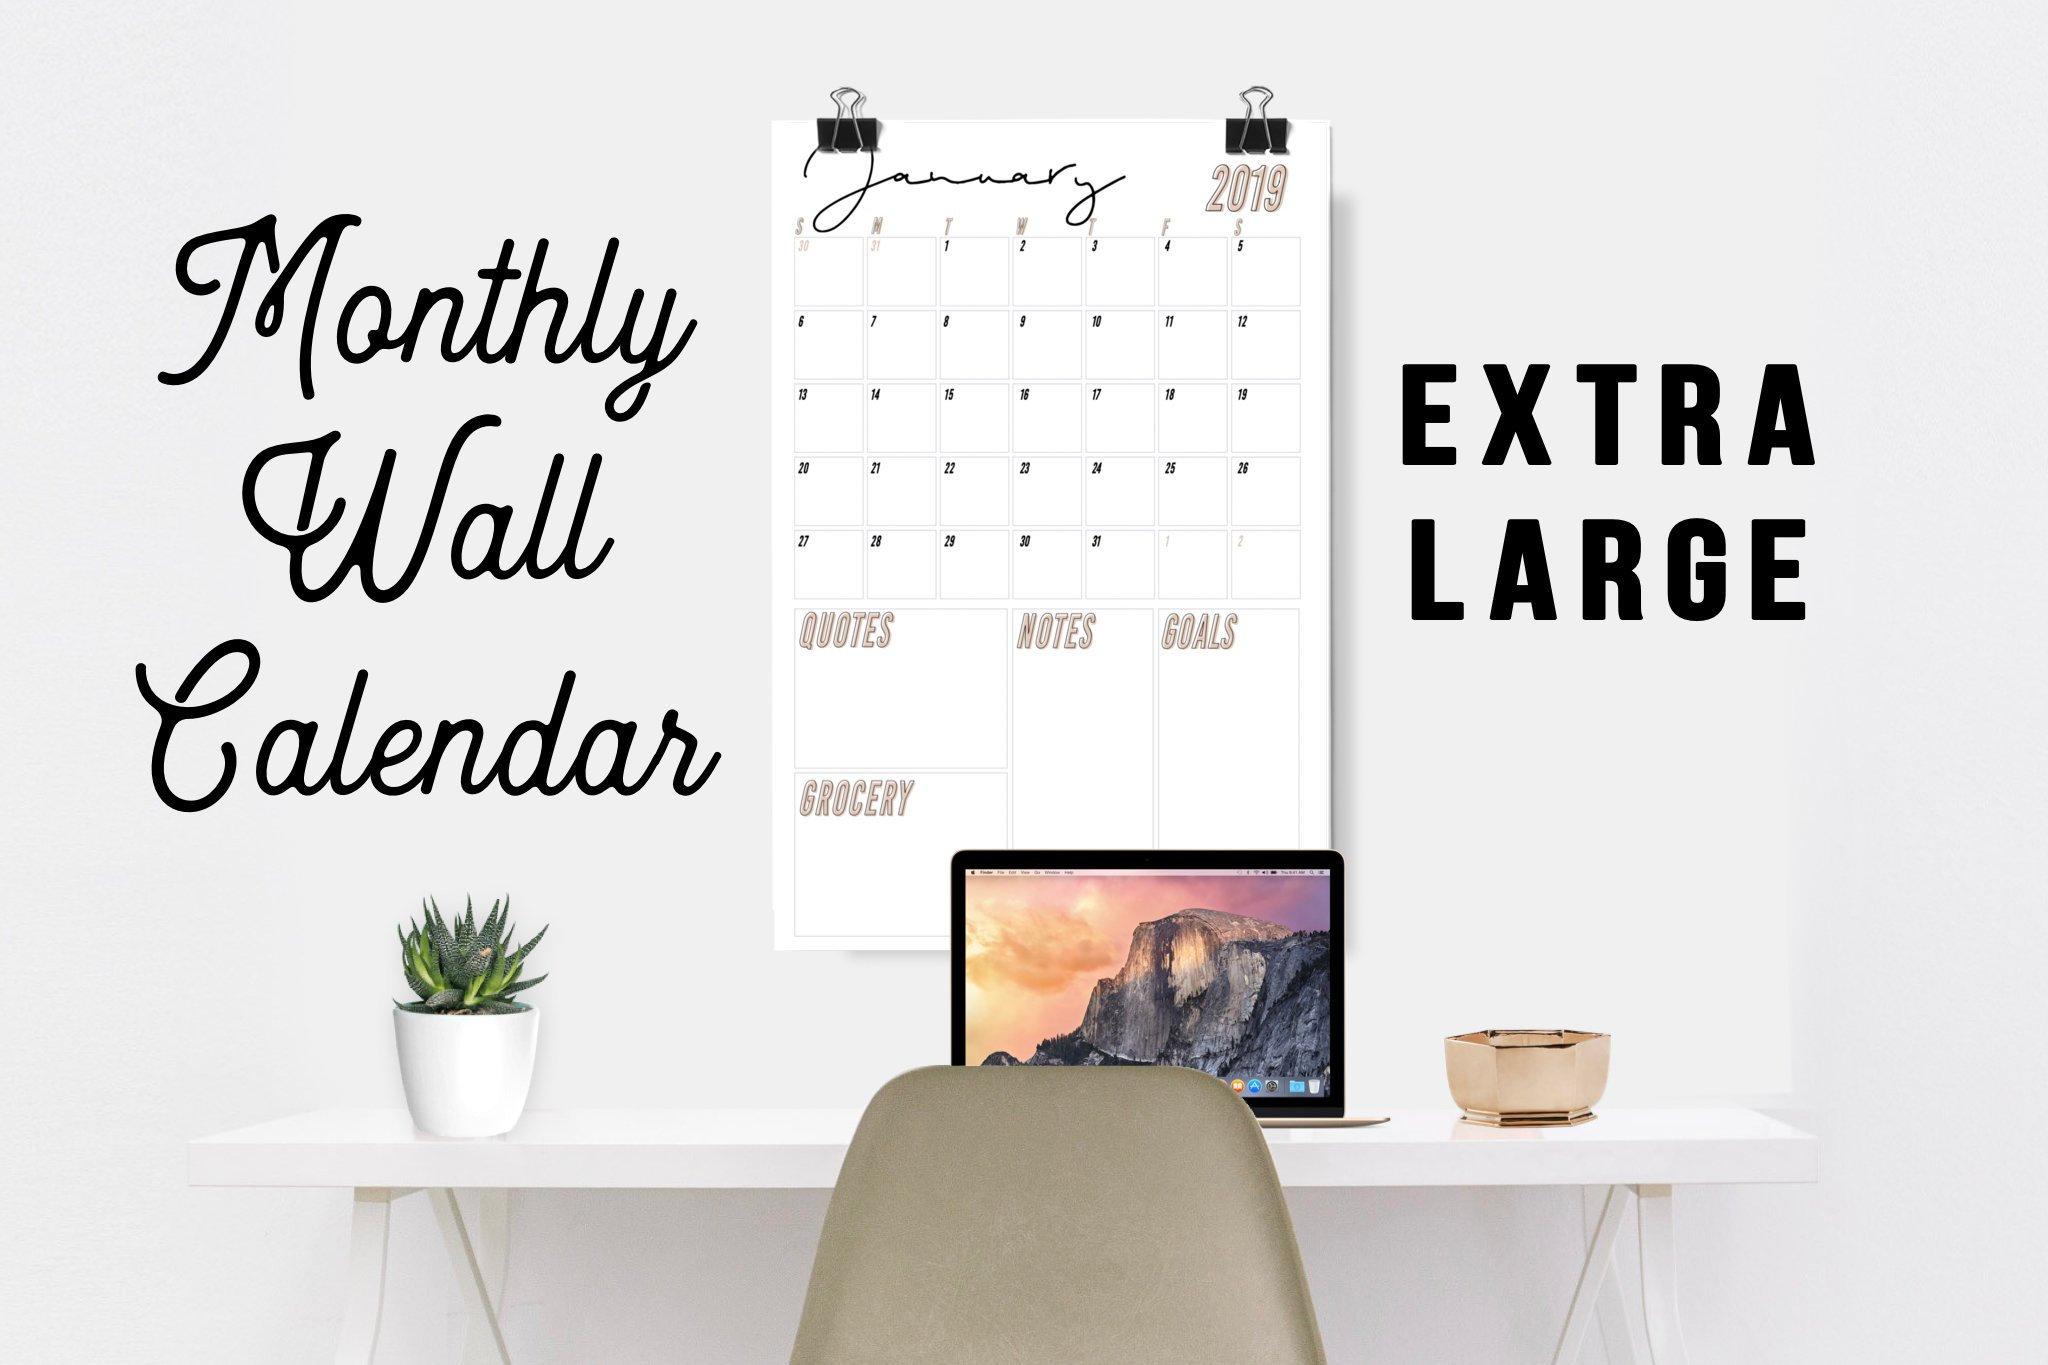 20182019 Extra Large Wall Calendar Printable with regard to Extra Large Photo Calendar